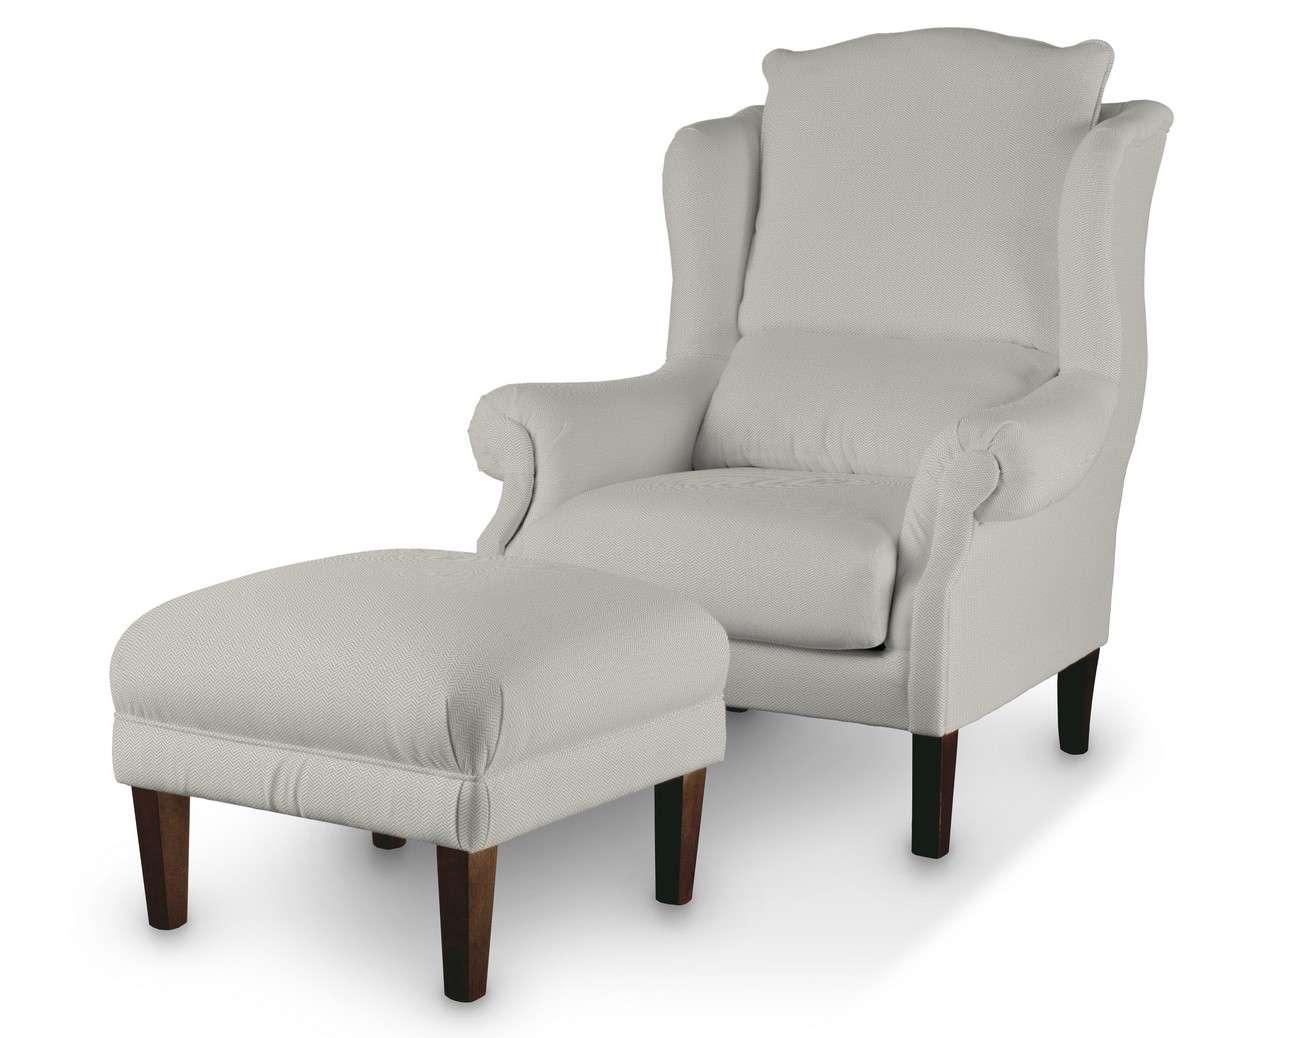 Podnóżek do fotela w kolekcji Bergen, tkanina: 161-84